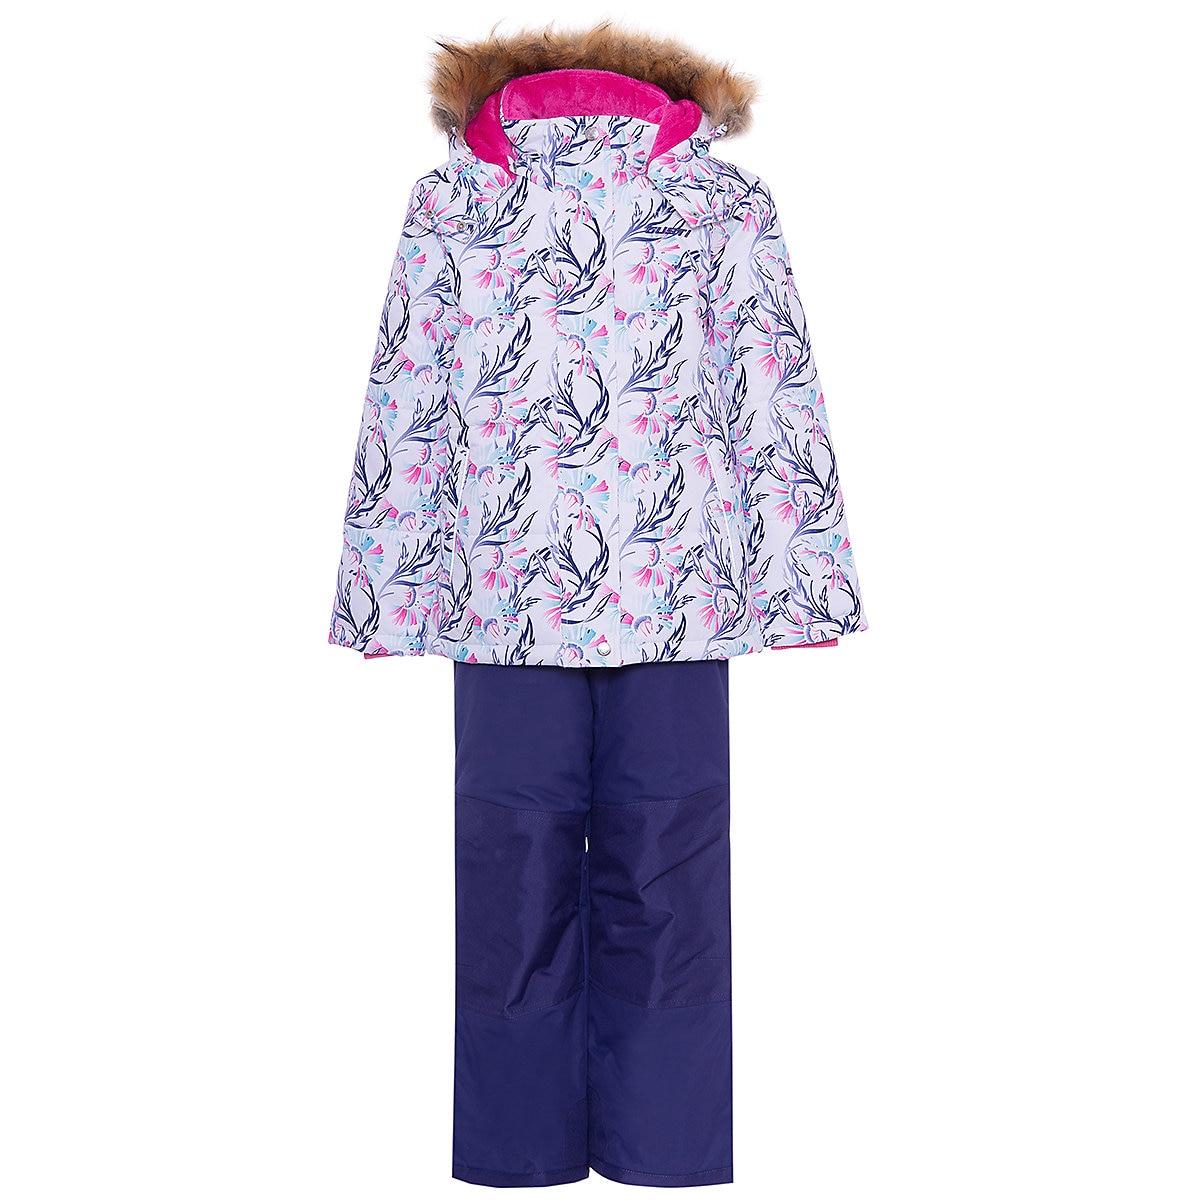 GUSTI enfants \'s ensembles 9511999 vêtements pour filles ensemble robe hiver vêtements fille enfants portent MTpromo